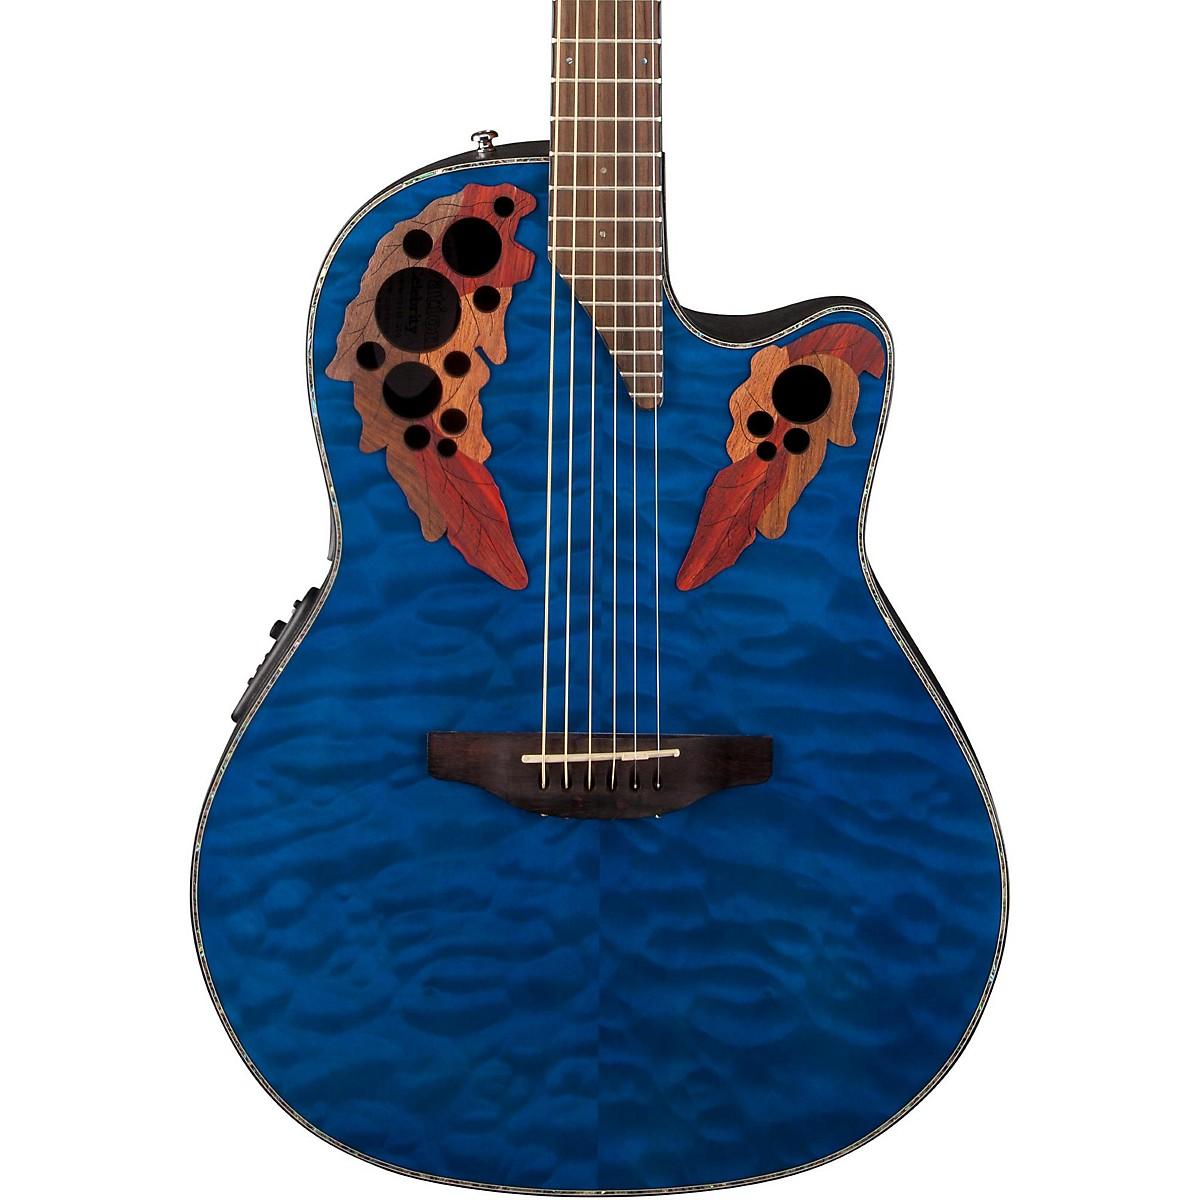 Ovation Celebrity Elite Plus Acoustic-Electric Guitar